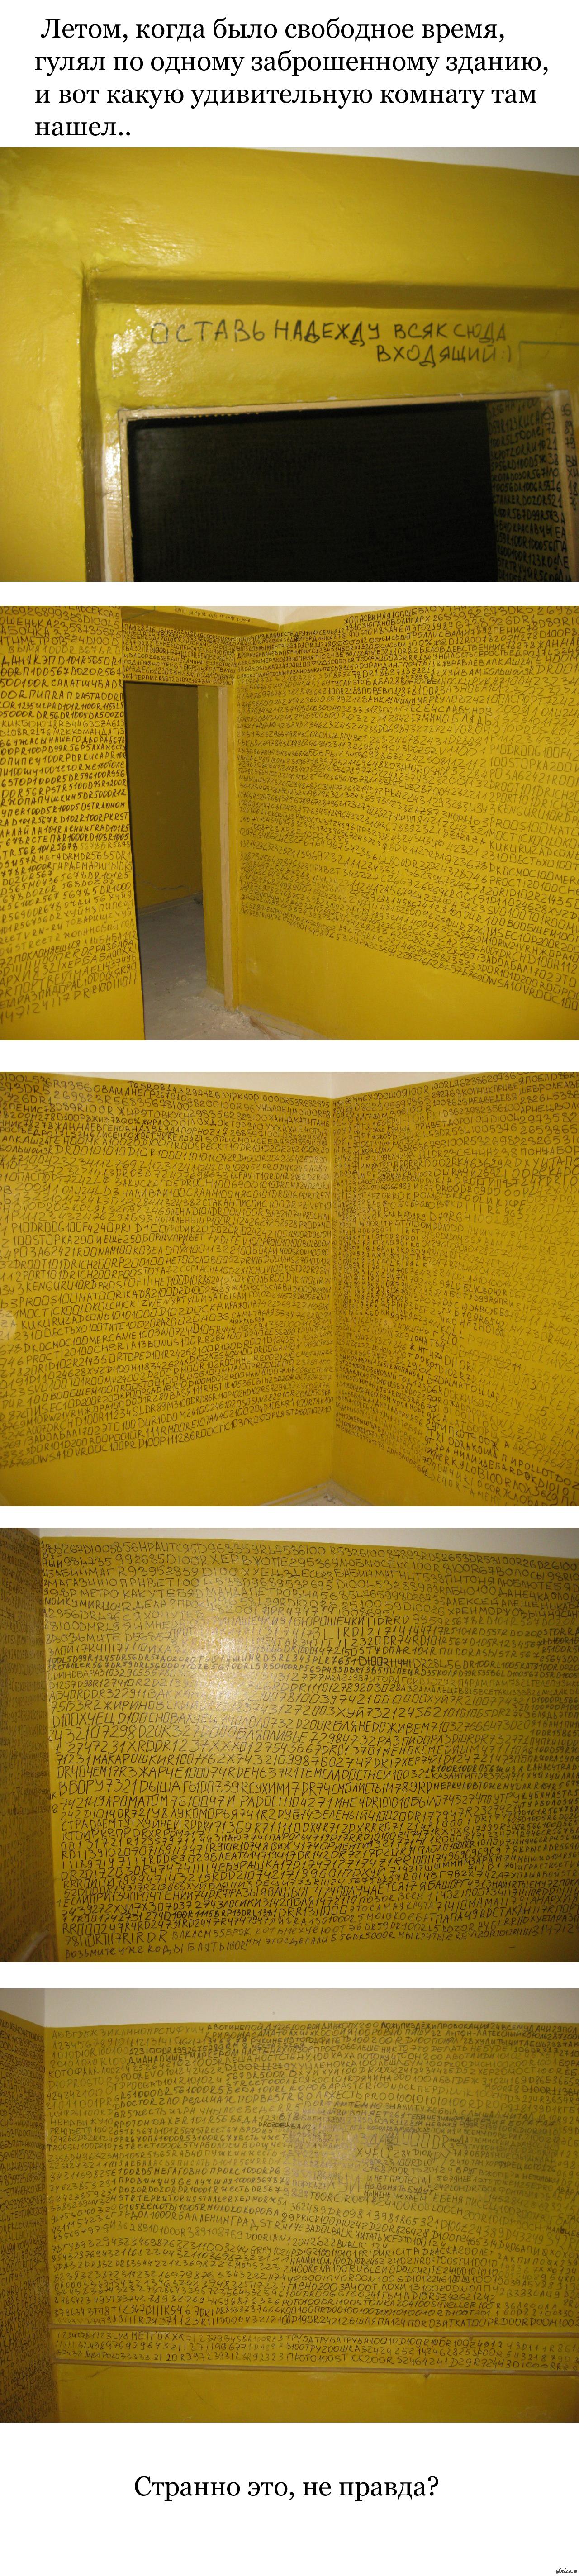 "Психоделическая комната По мотивам <a href=""http://shop-archive.ru/away/pikabu.ru/story/nashel_strannuyu_tetradku_1922779"">http://shop-archive.ru/away/pikabu.ru/story/_1922779</a>"